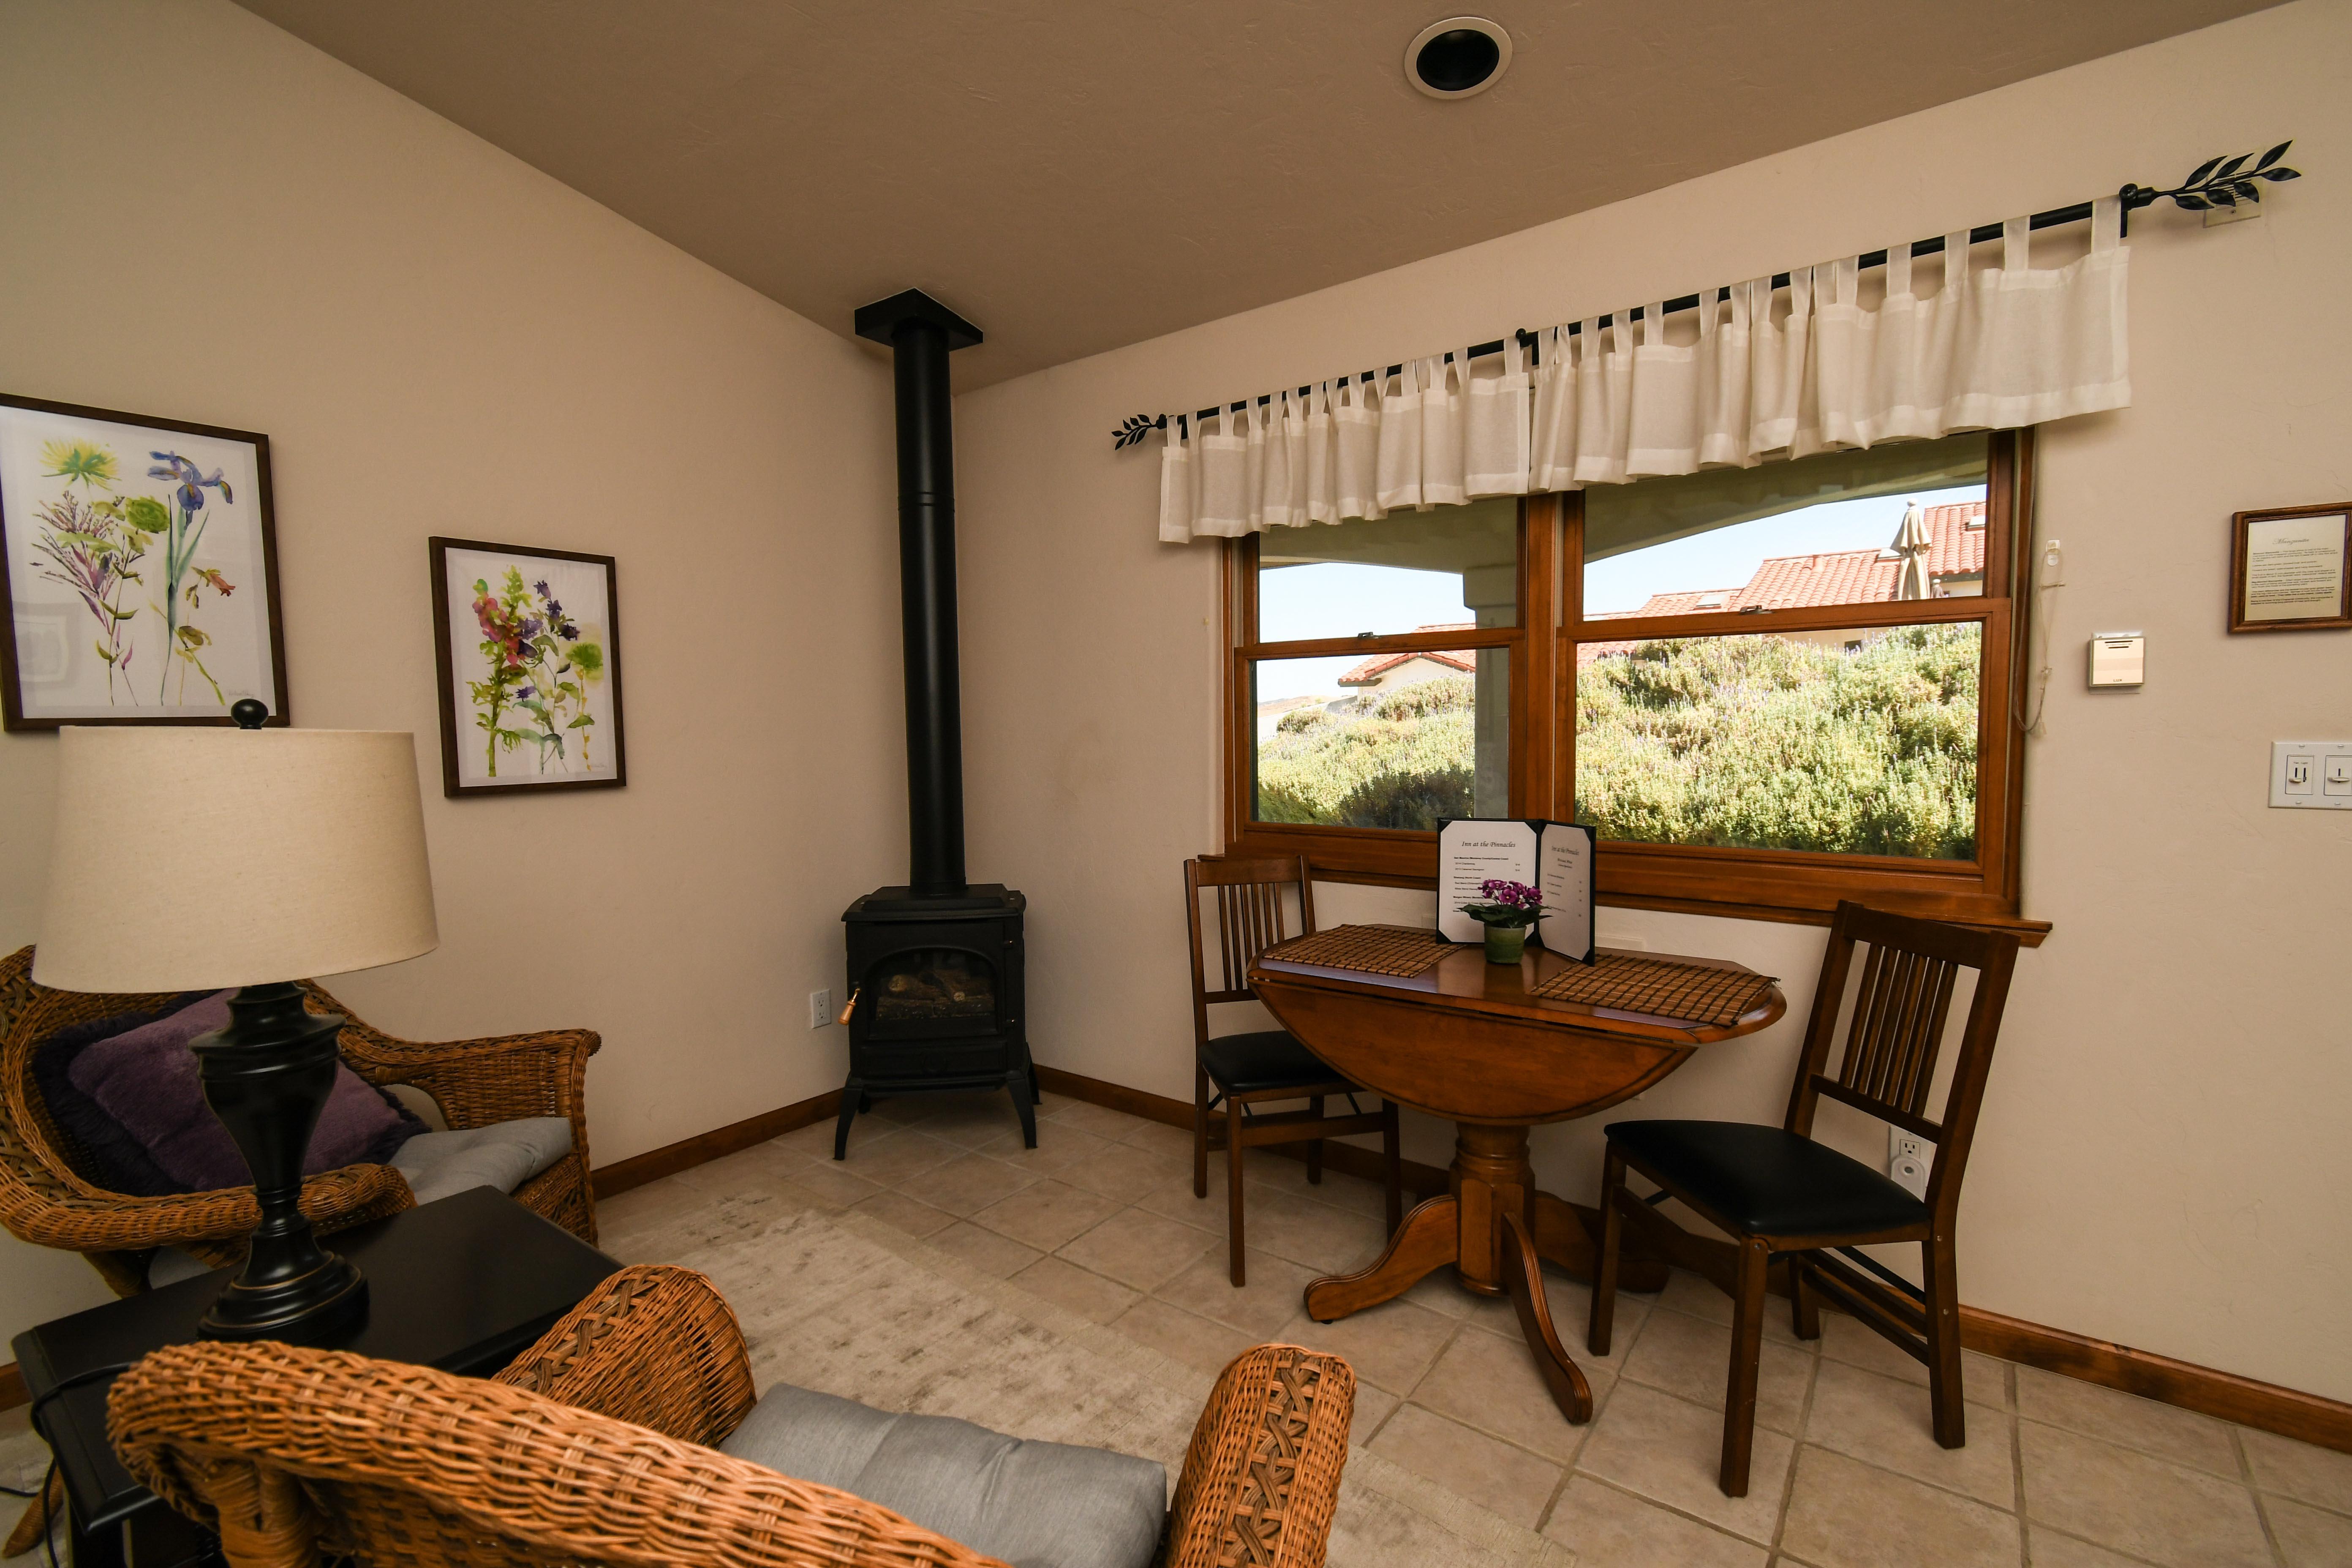 Manzanita Room 3 | Luxury Bed and Breakfast Inn